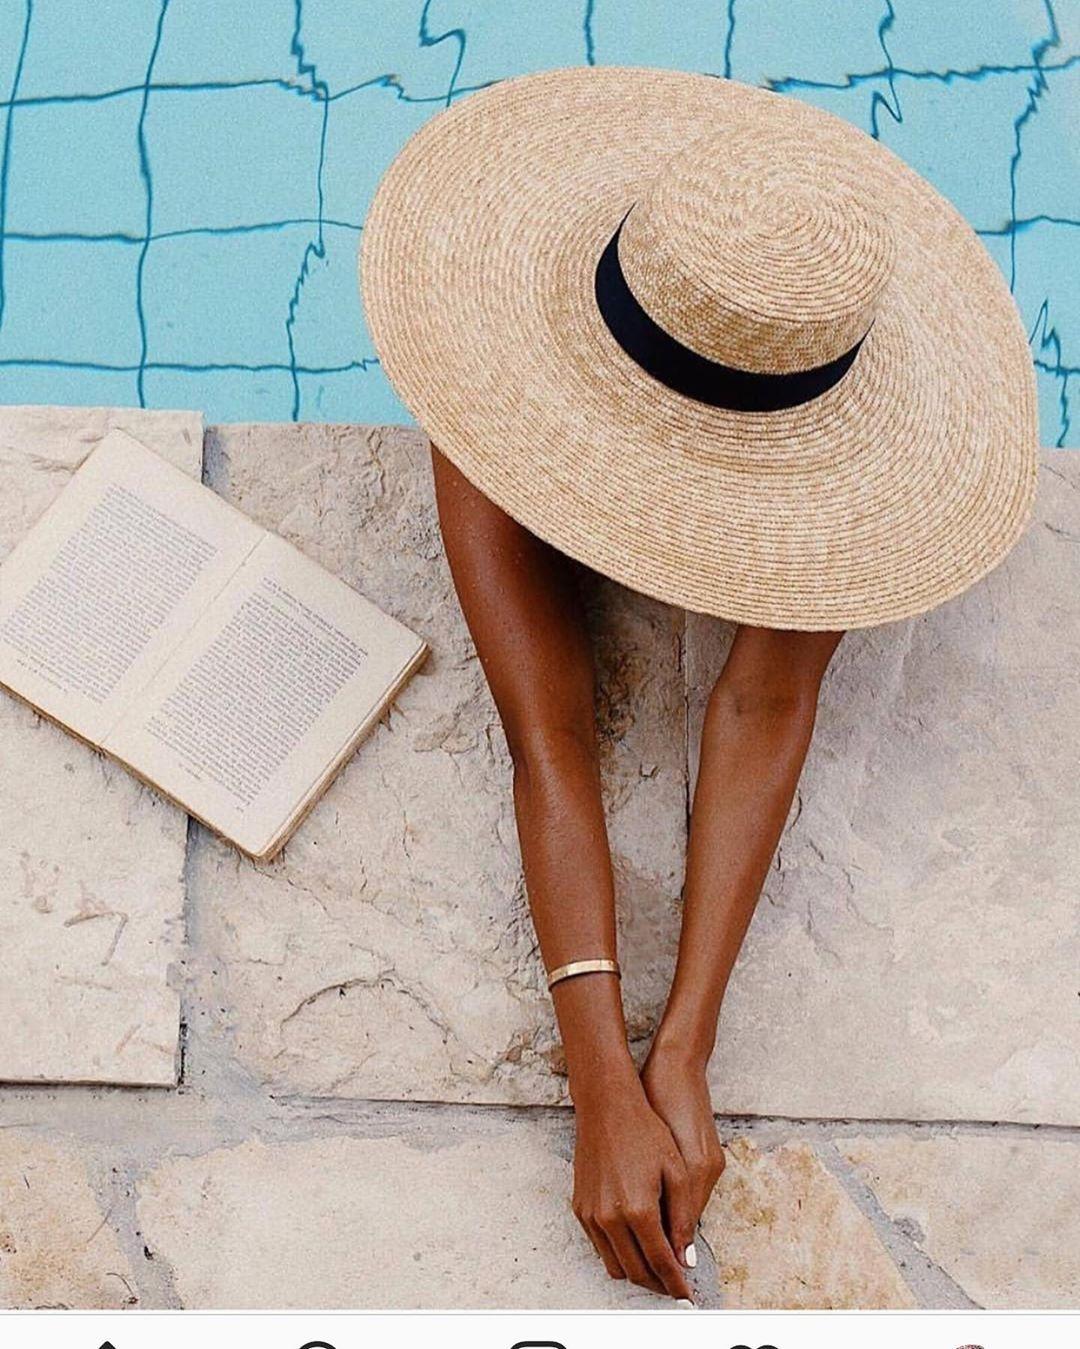 3 Approaches That Affect Women Entrepreneurship Beach Hat Poolside Fashion Summer Photos